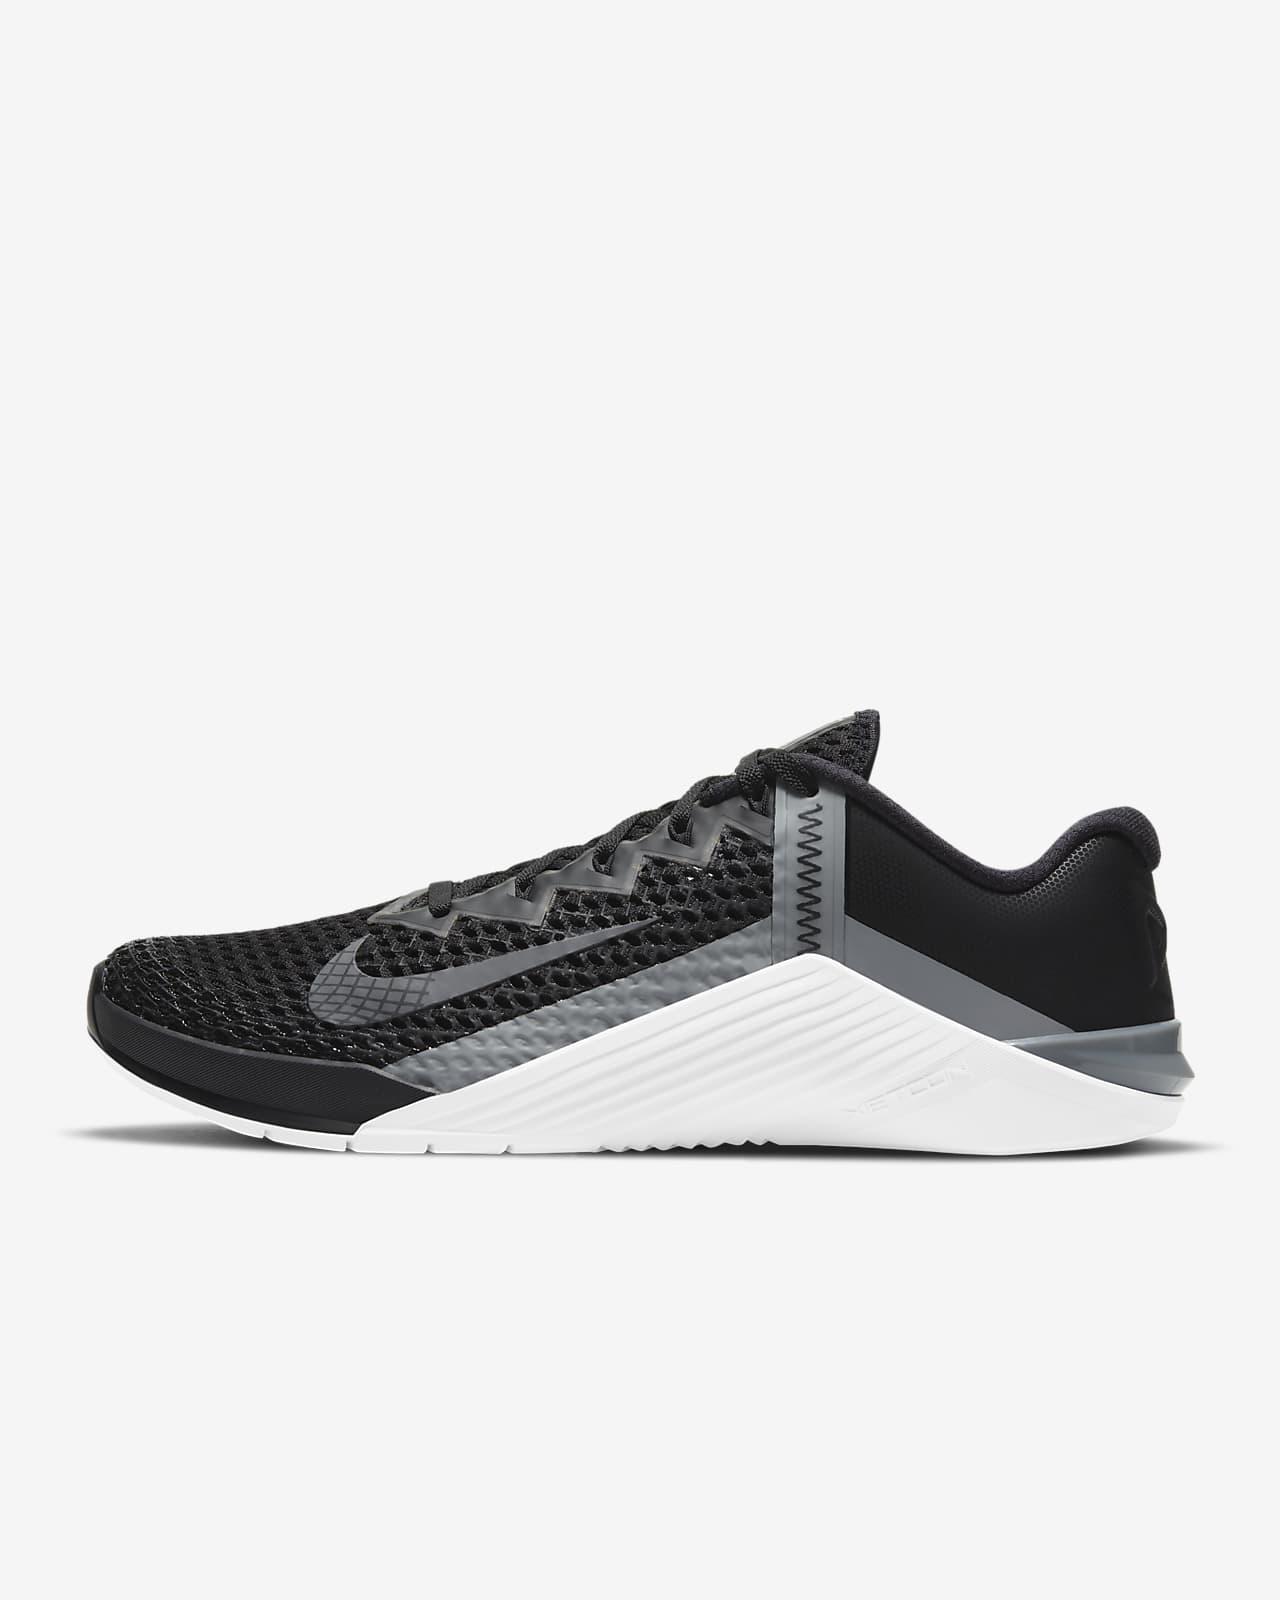 Nike Metcon 6 Men's Training Shoes